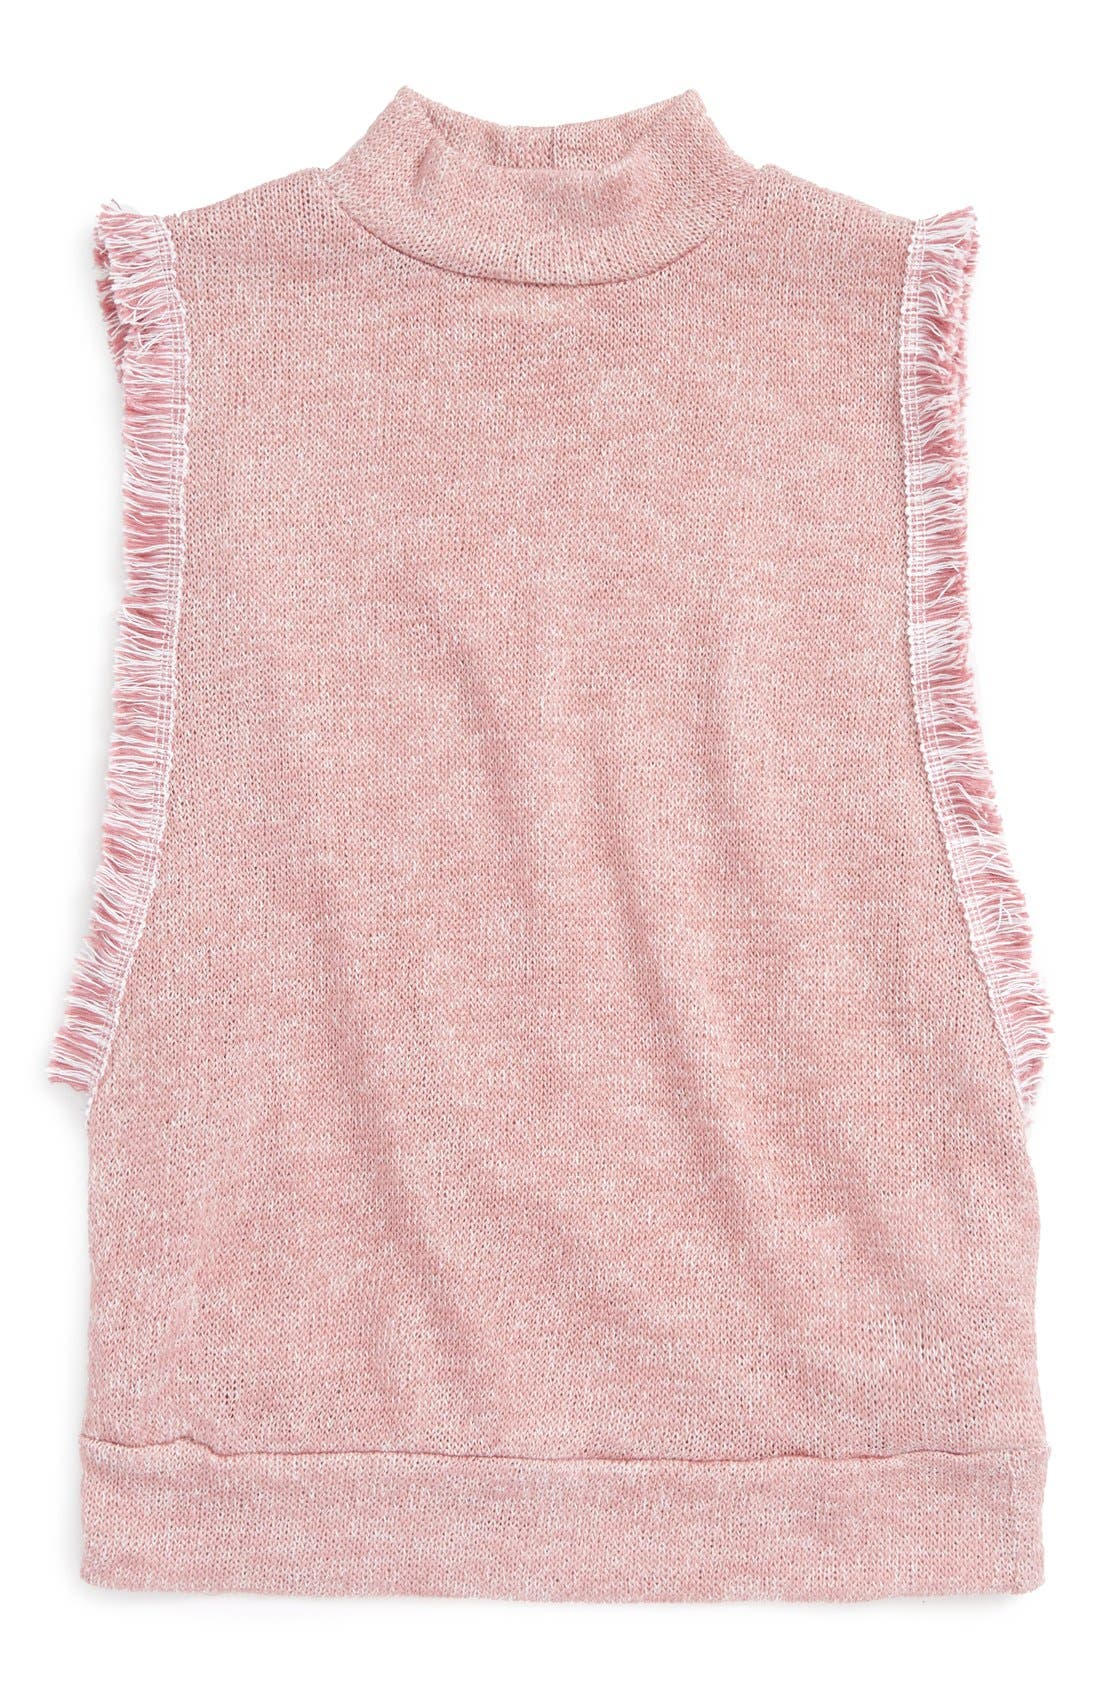 Main Image - h.i.p. Mock Neck Knit Top (Big Girls)